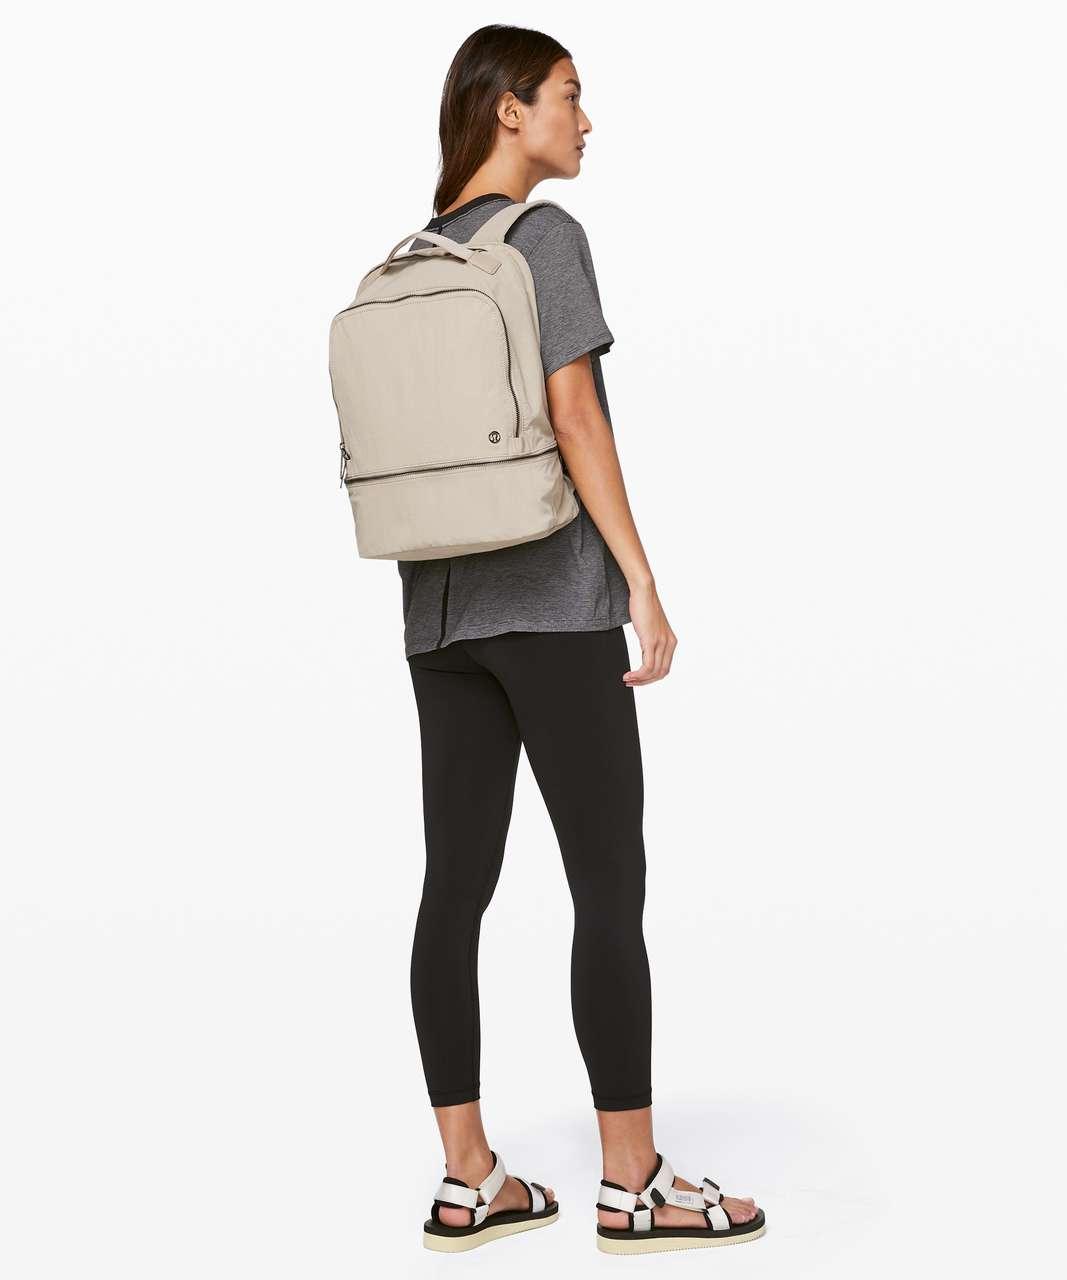 Lululemon City Adventurer Backpack *17L - Sandlot